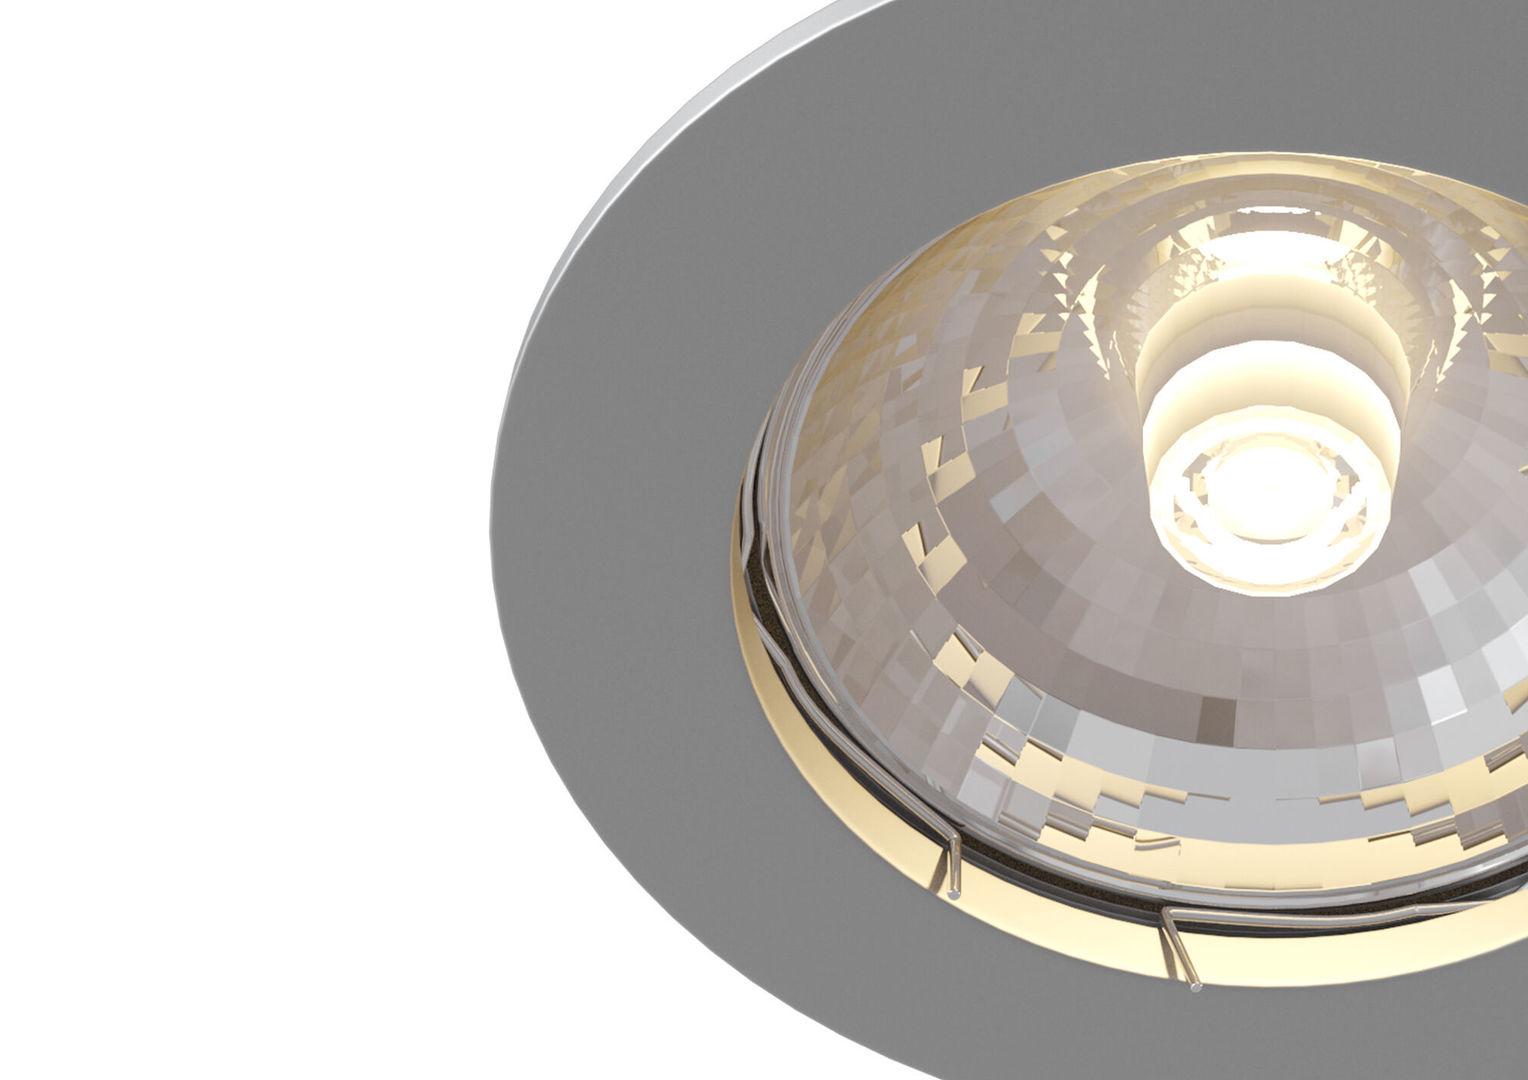 Corp de iluminat încorporat Maytoni Metal Modern DL009-2-01-CH